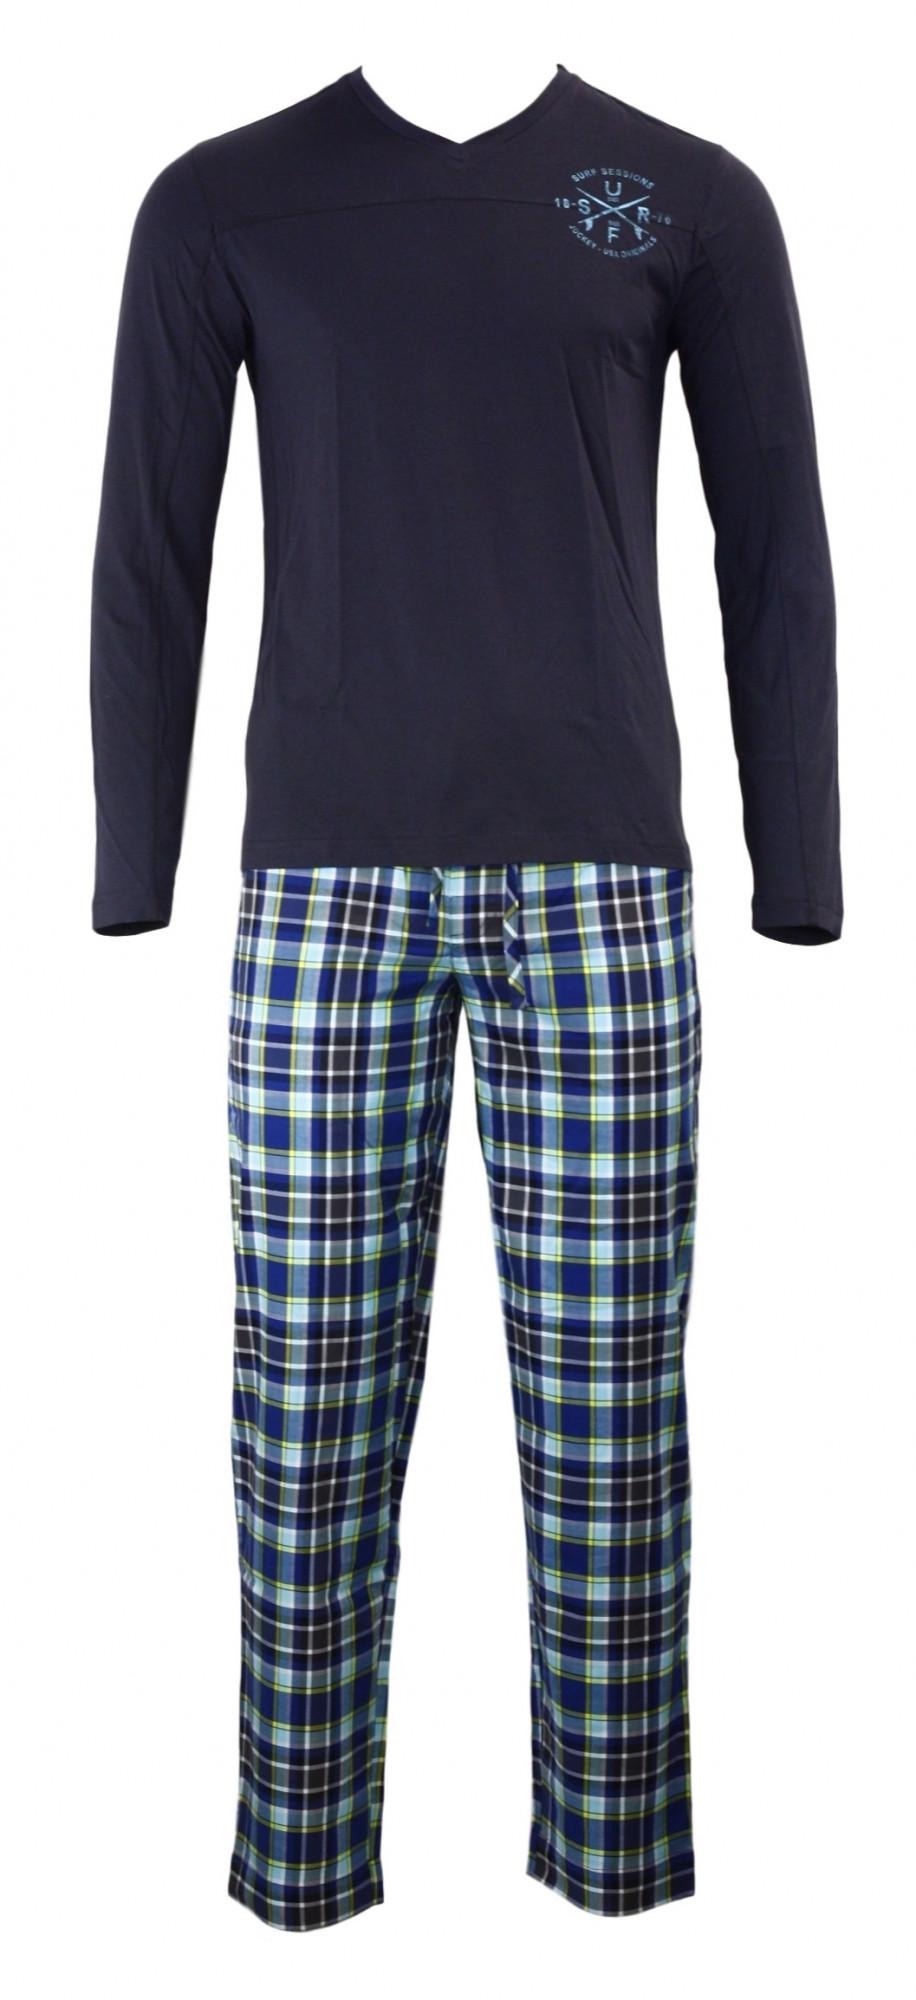 Pánské pyžamo 552003 - Jockey Barva: modrá, Velikost: M